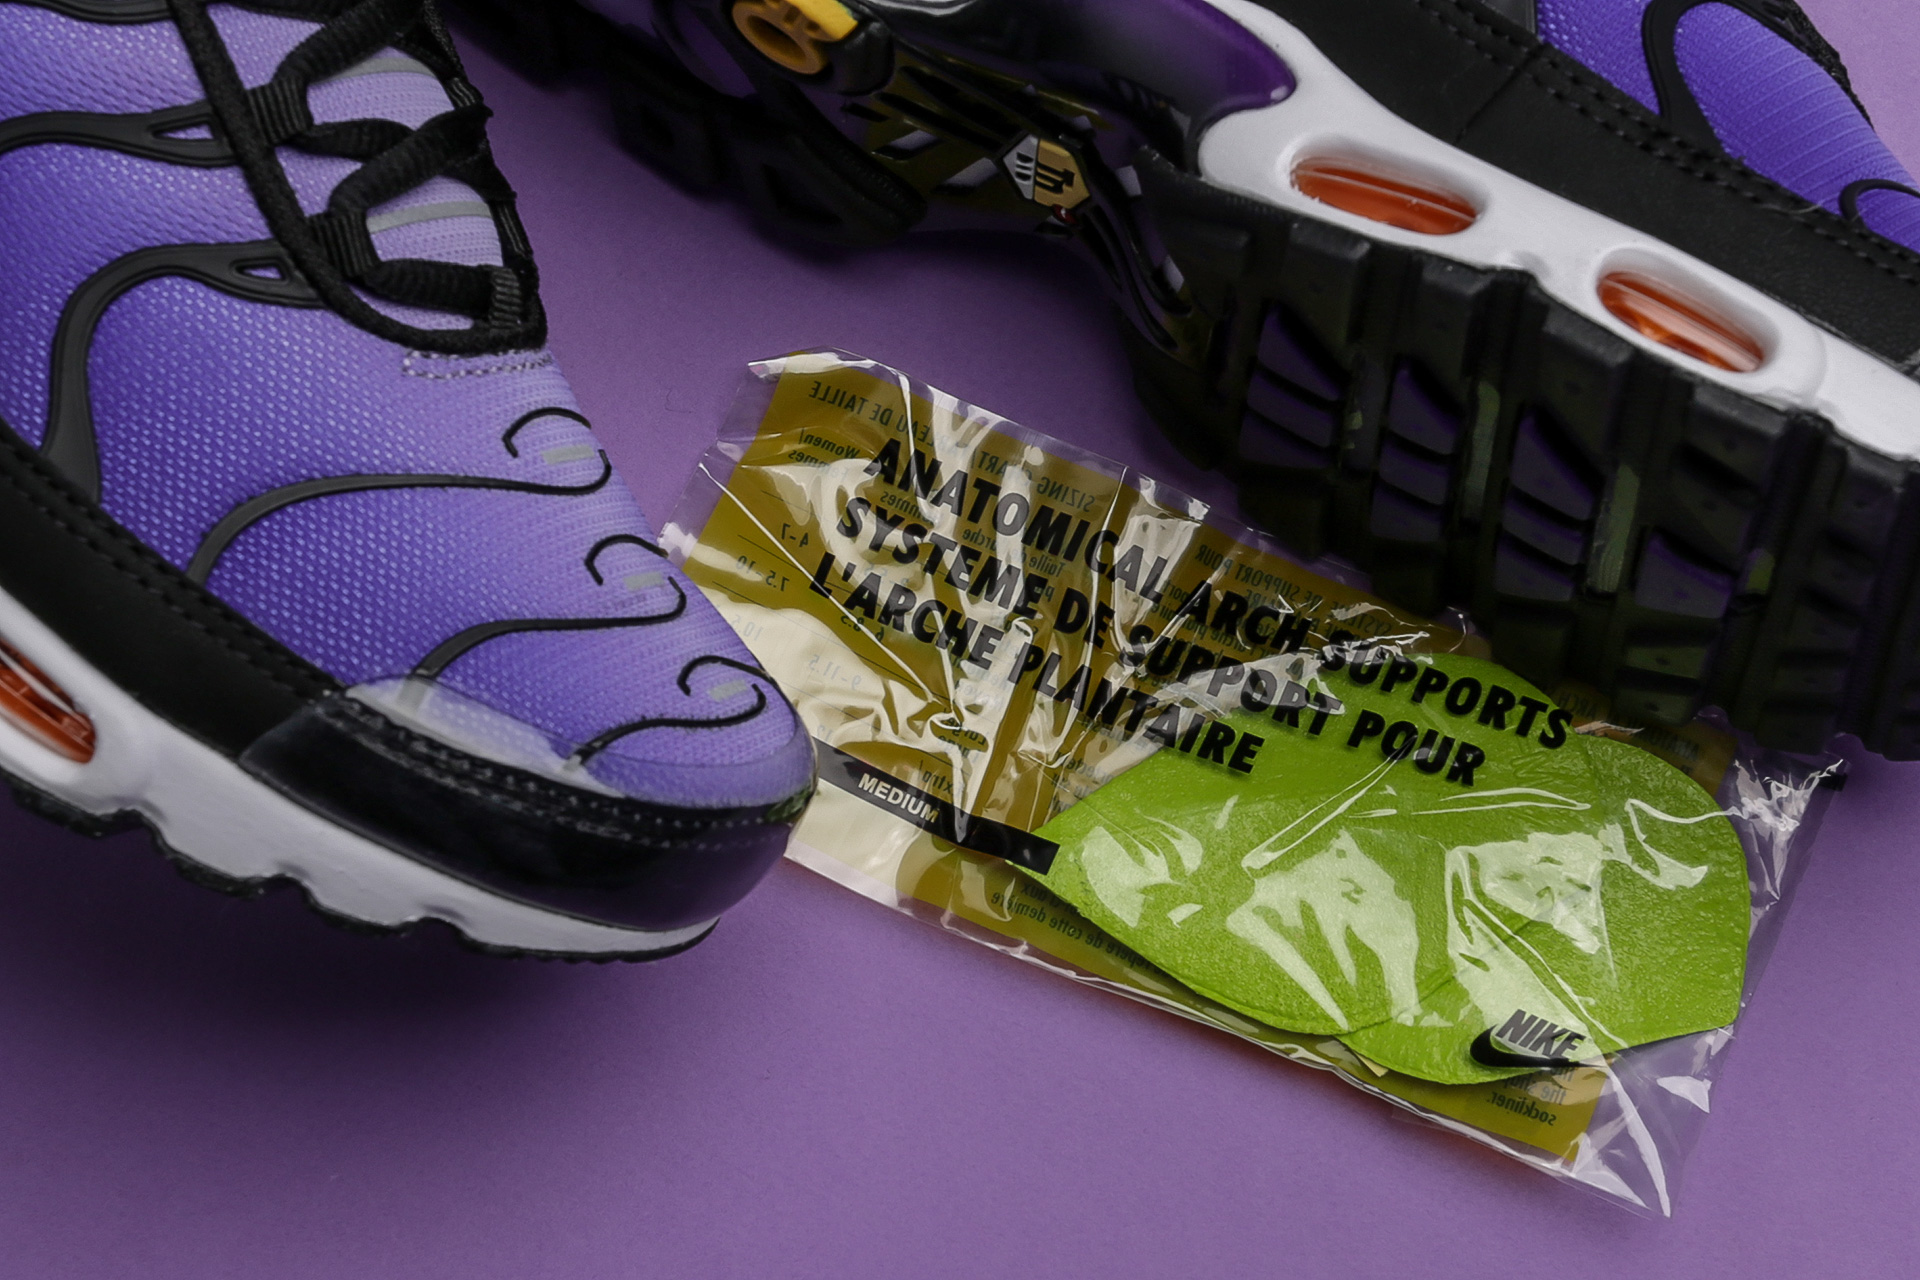 64e5f0227f3a5d ... Купить мужские фиолетовые кроссовки Nike Air Max Plus OG - фото 3  картинки ...